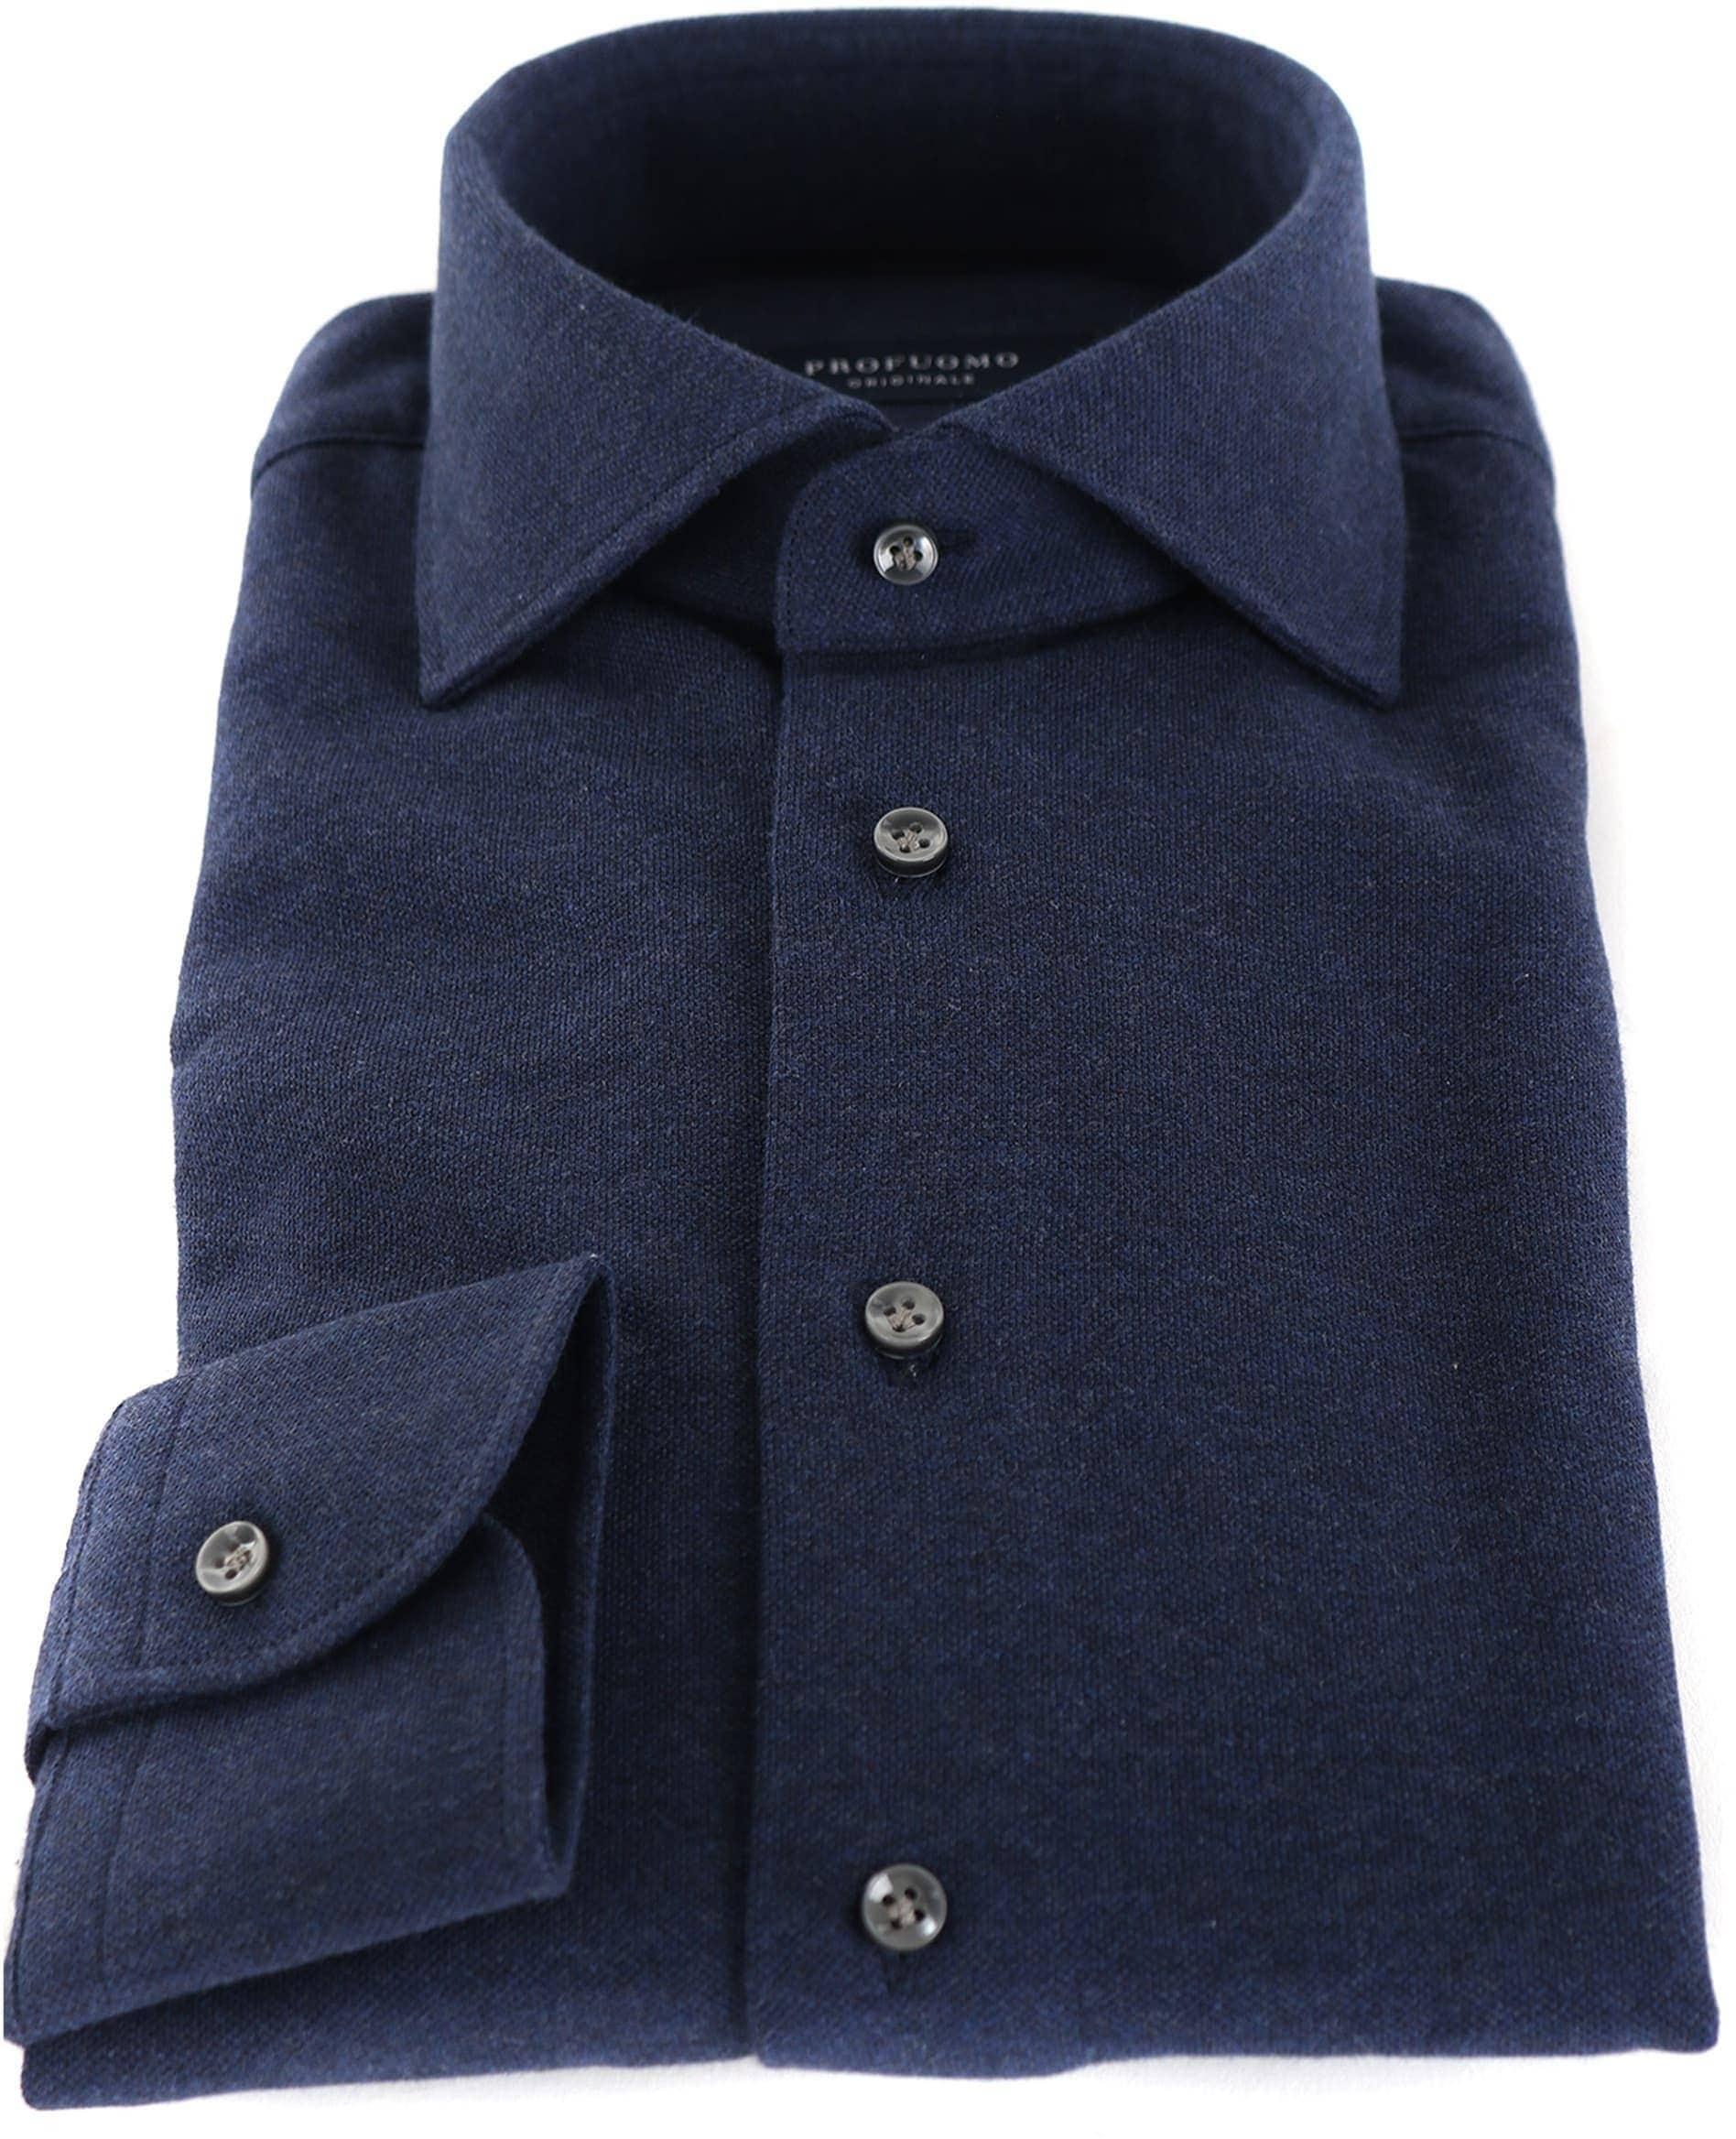 Profuomo Shirt Knitted Dark Blue foto 1